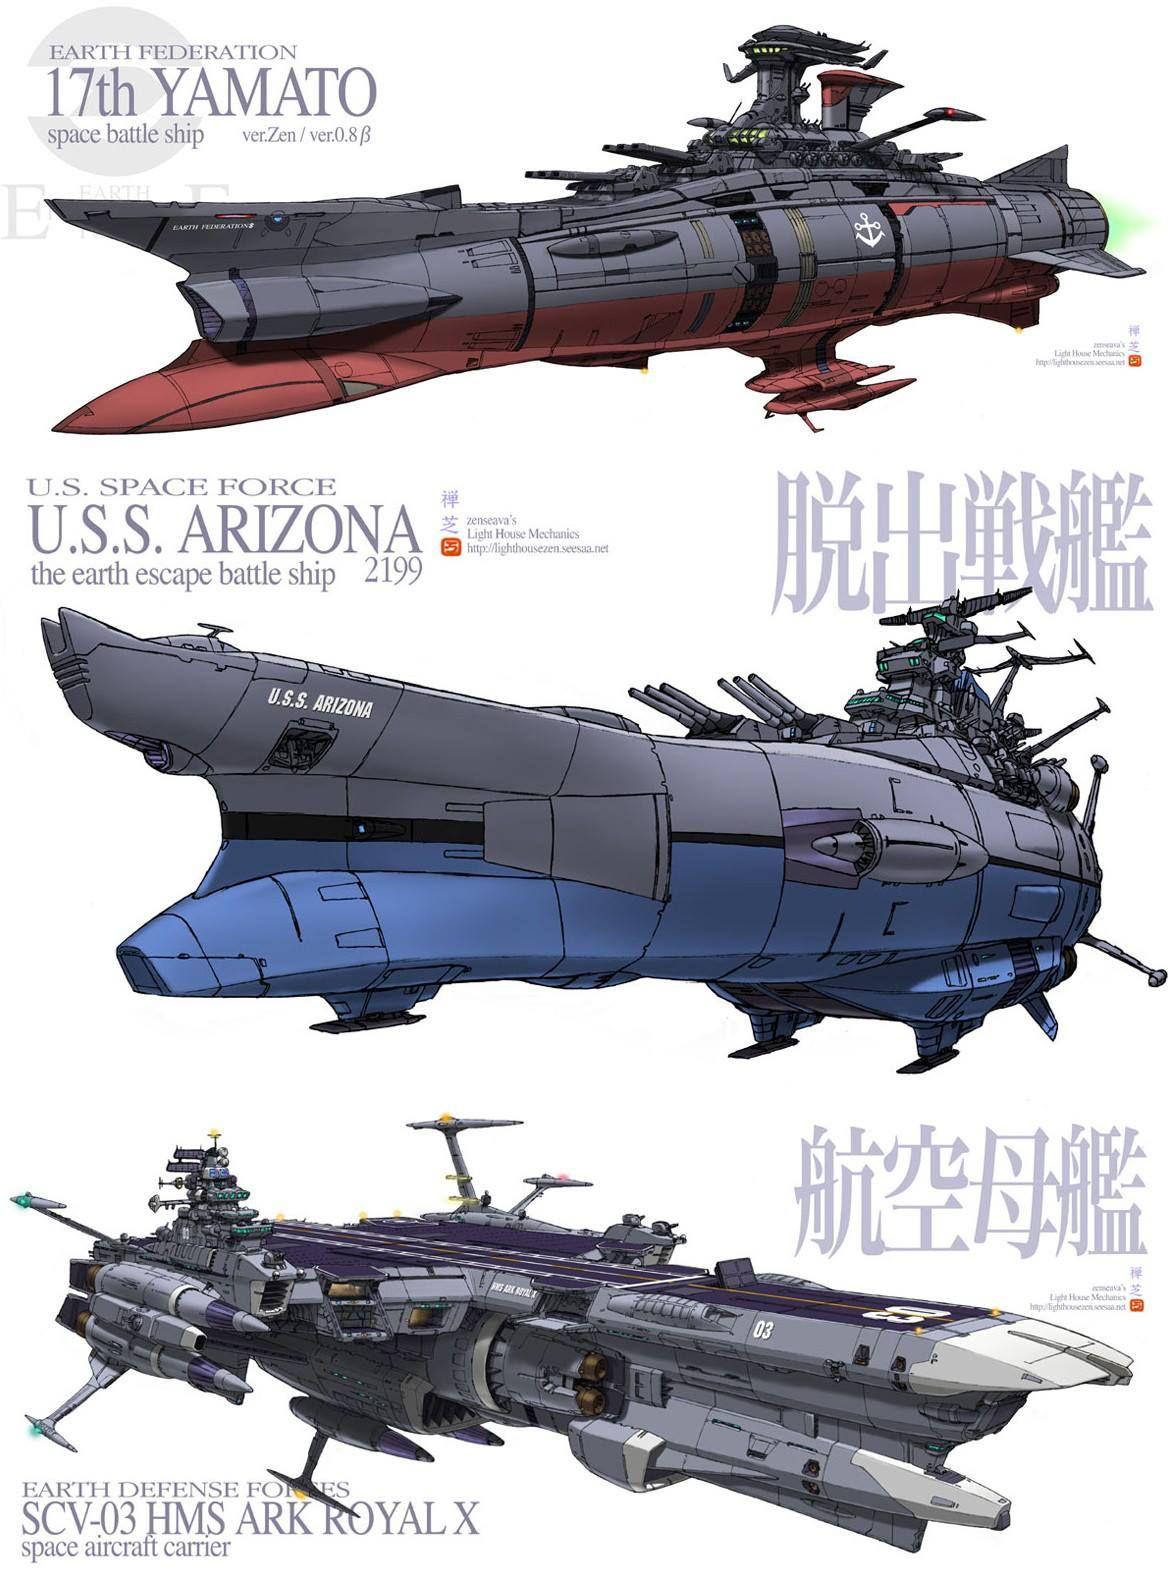 Space Battleship Yamato ships. 17th Yamato, U.S.S. Arizona ...